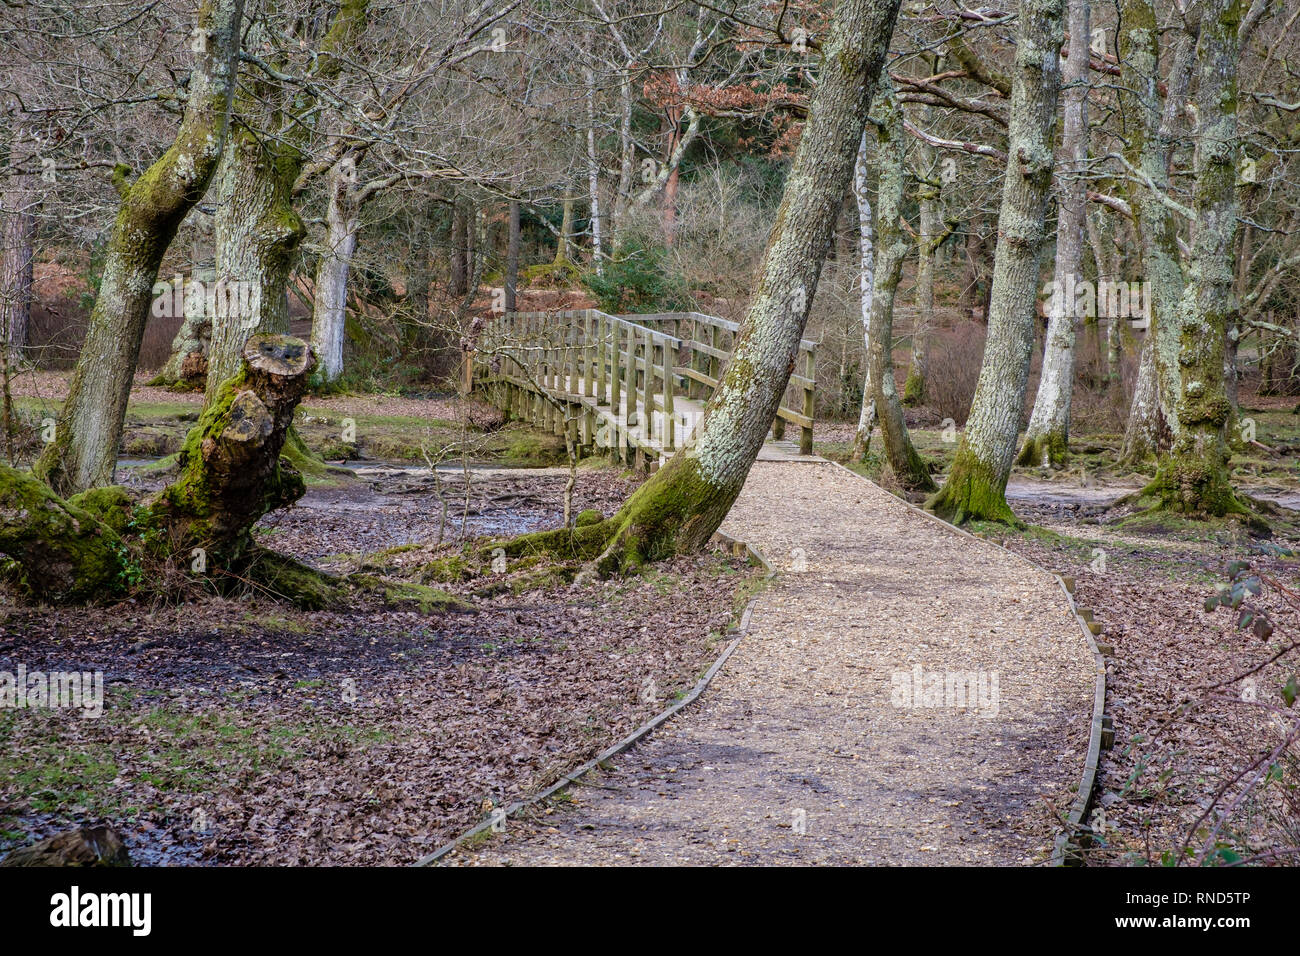 New Forest, Puttles Bridge, Ober Water, Rhinefield Walk, Brockenhurst, UK. Stock Photo